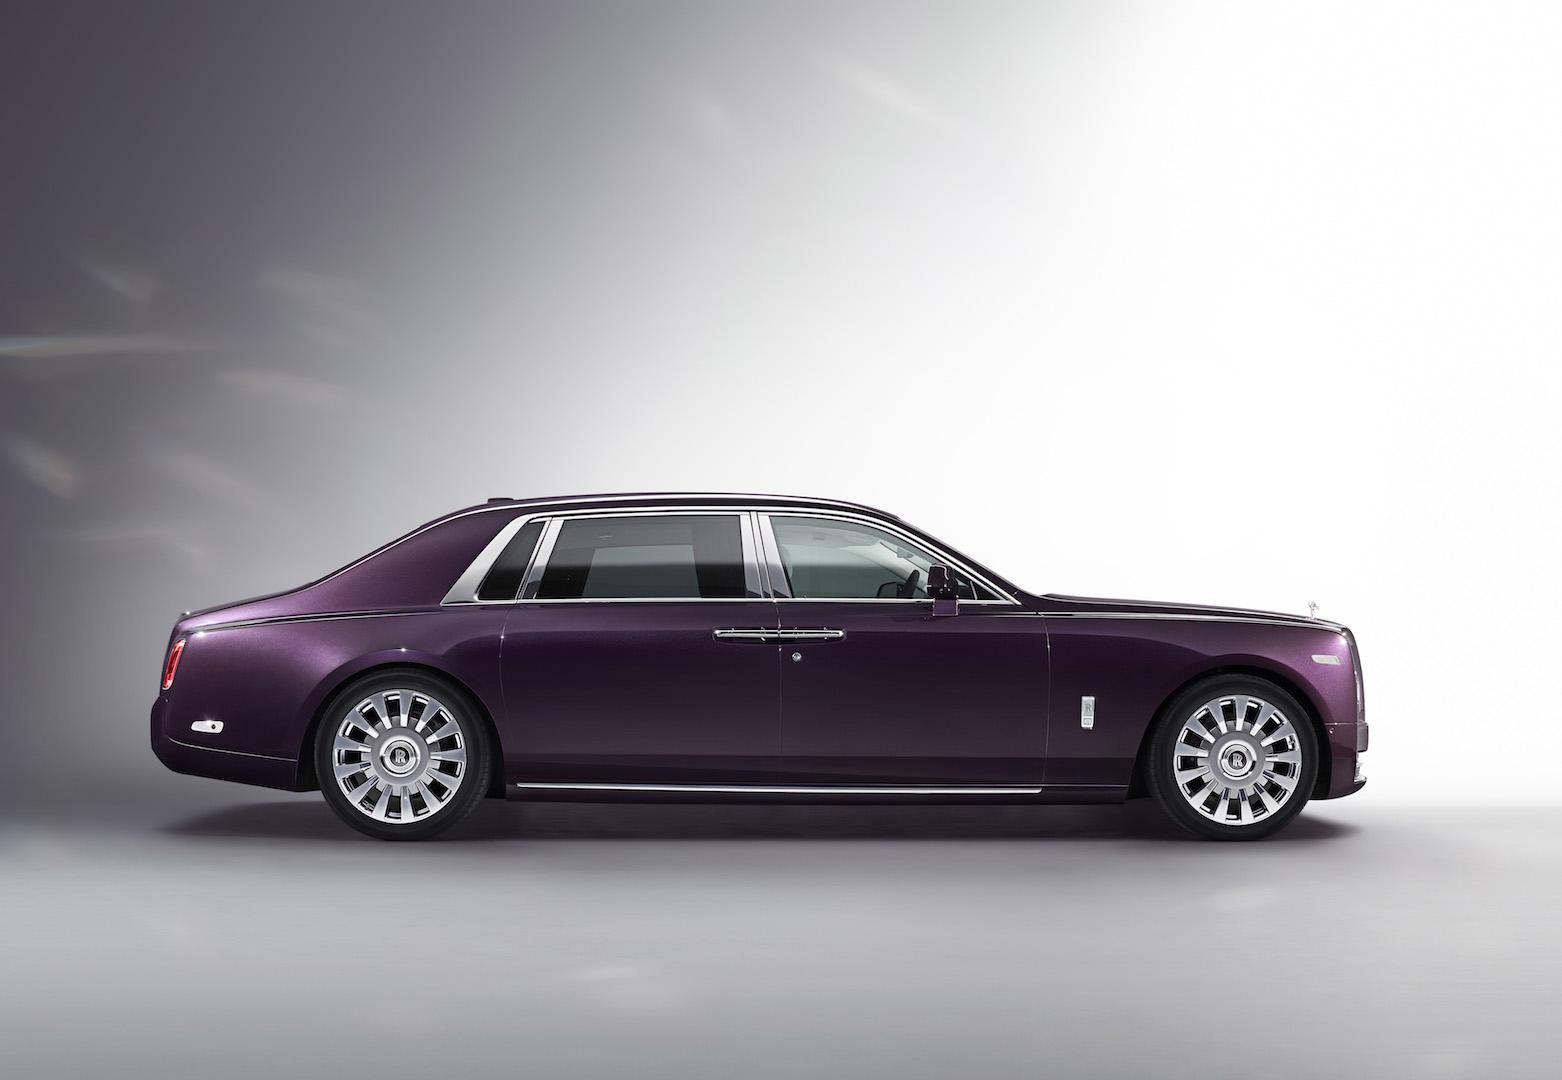 WORLD LXRY Rolls Royce Phantom 2